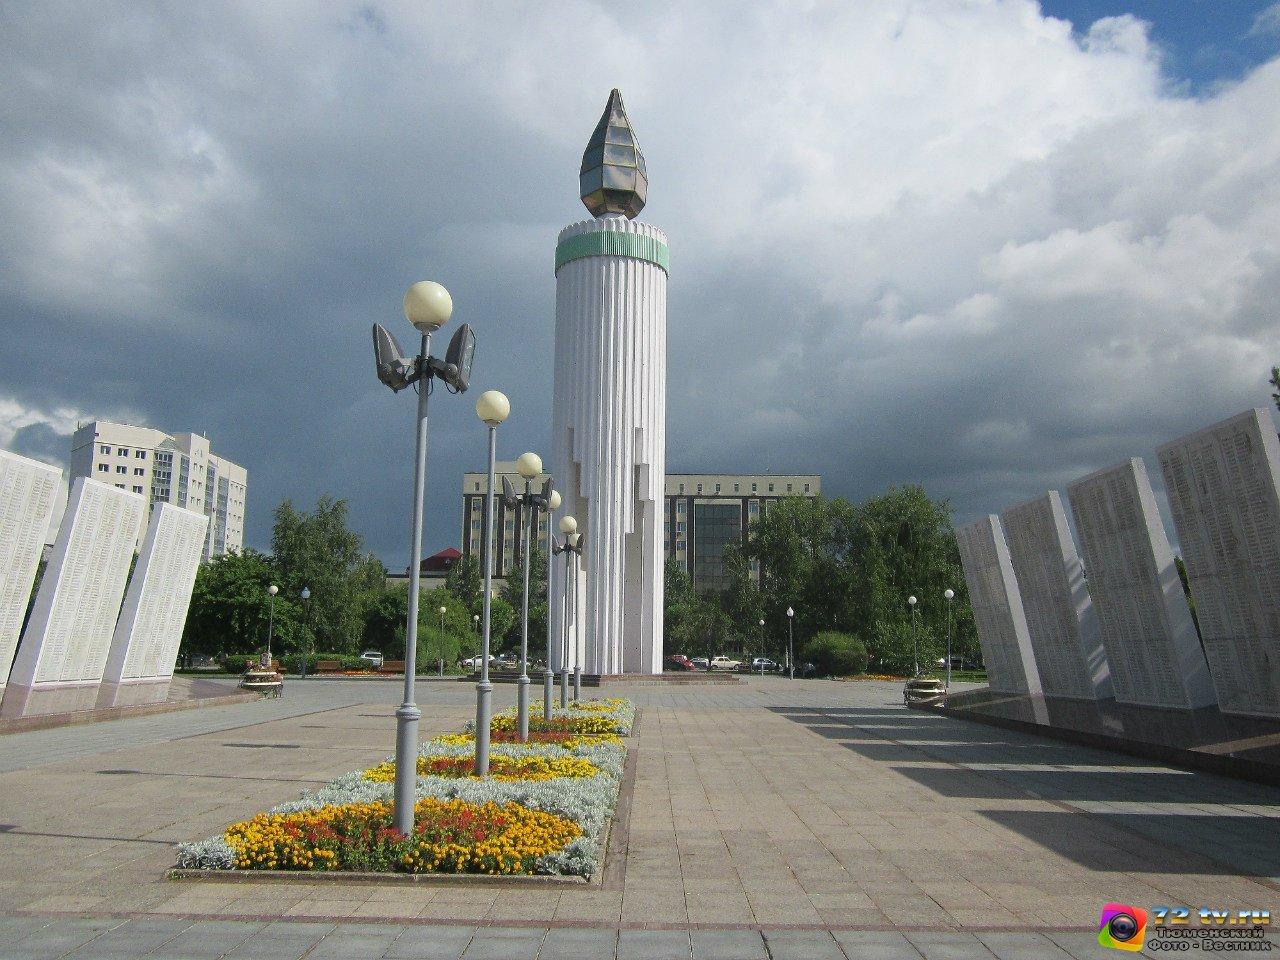 фото площадь памяти тюмень